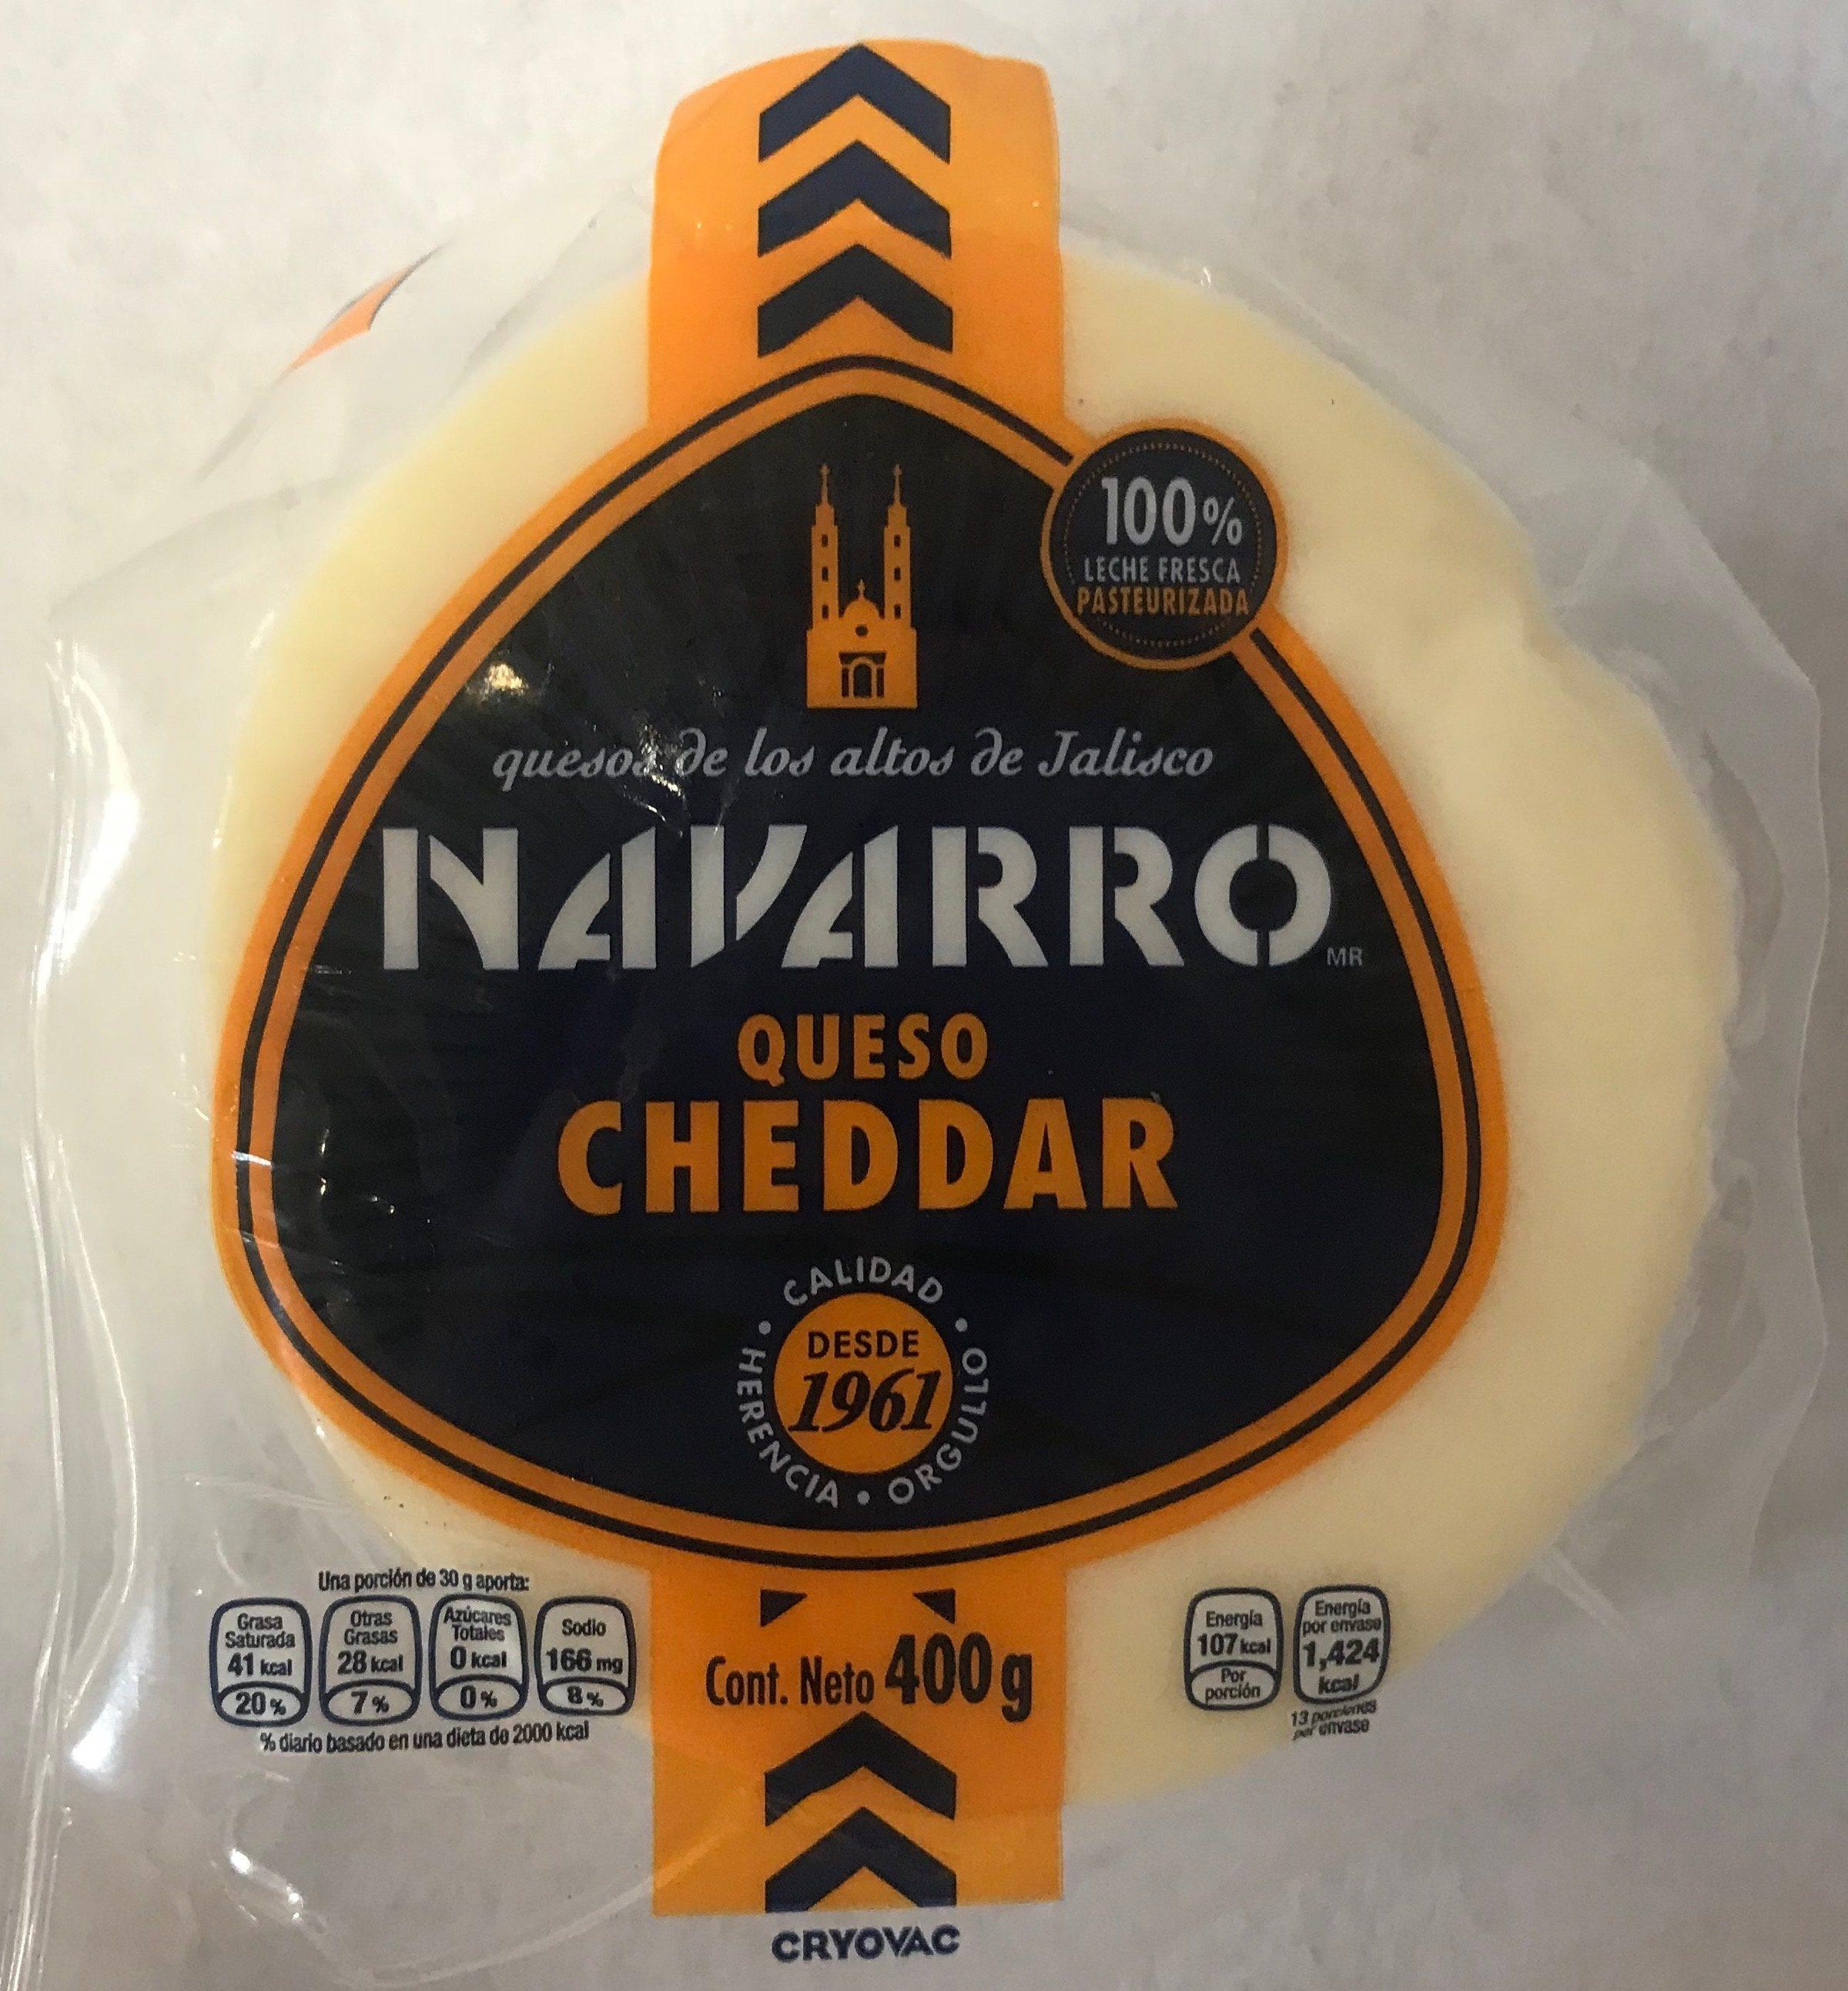 Queso Cheddar Navarro - Product - es